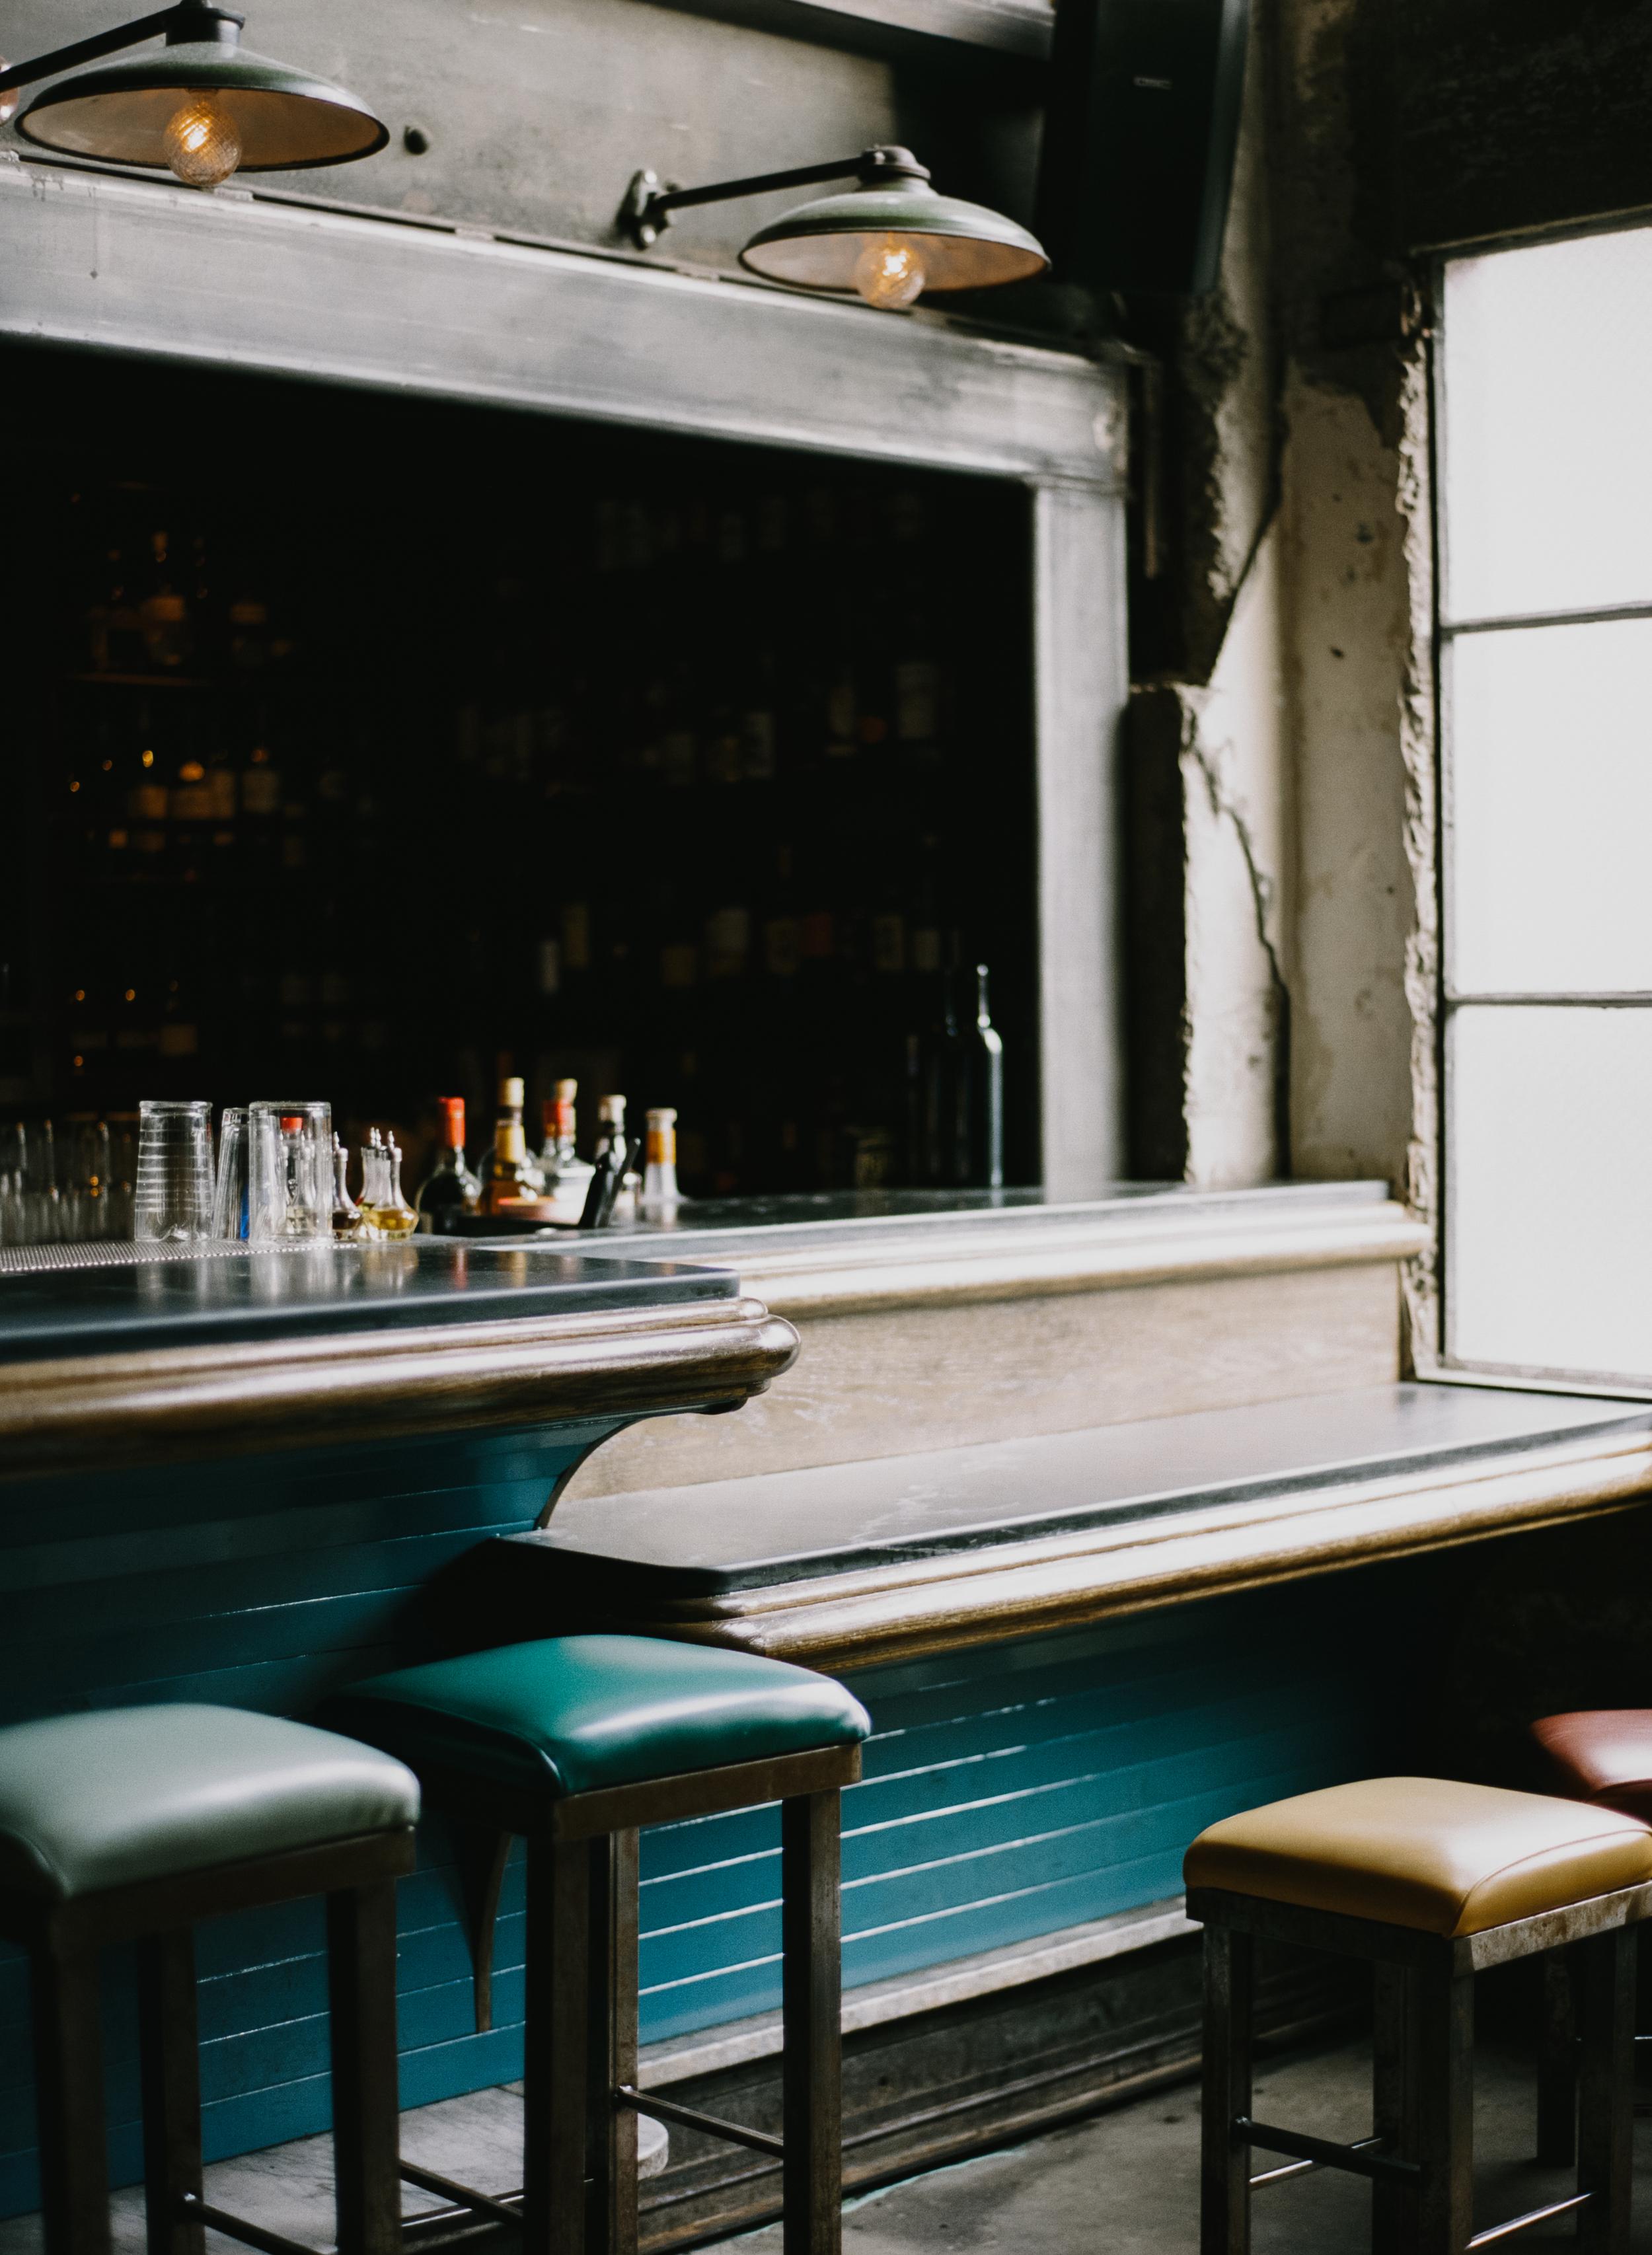 TrickDog_Bar_San_Francisco_City_Guide_Drinks_Cocktails_Lifestyle_Zack_Arp-762.jpg